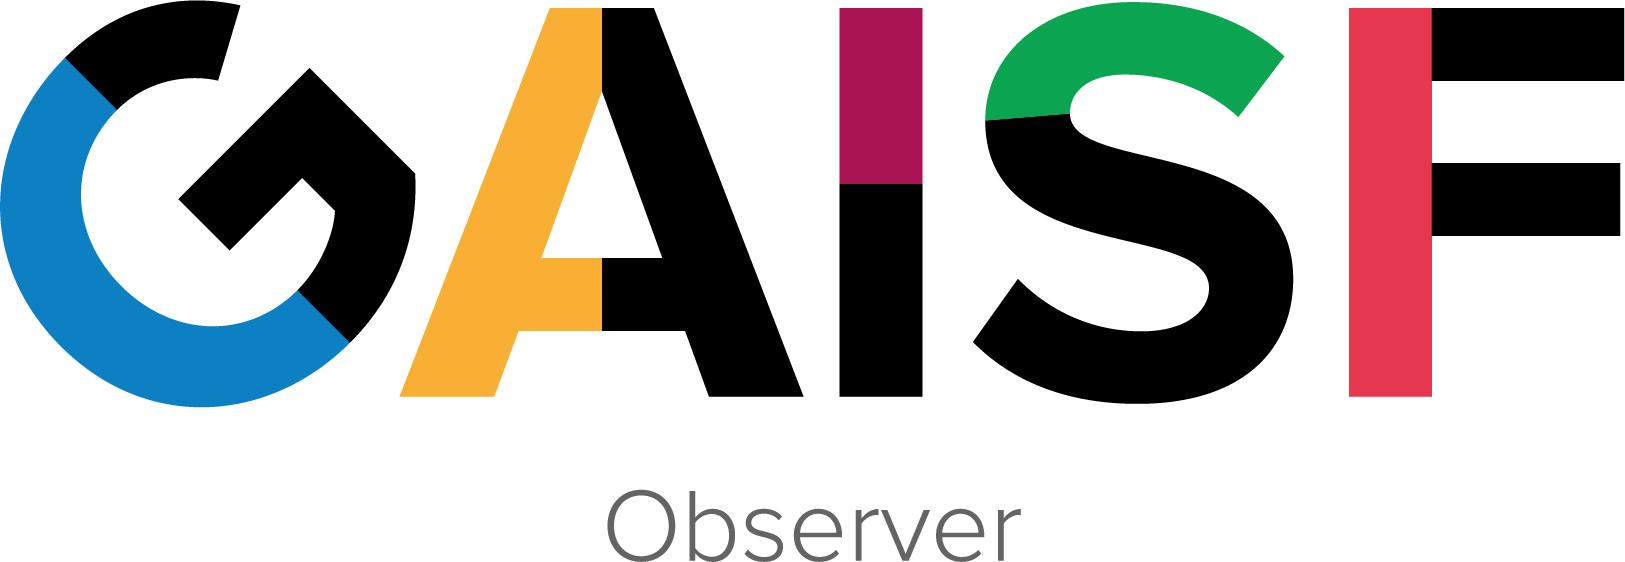 GAISF Observer logo RGB.jpg